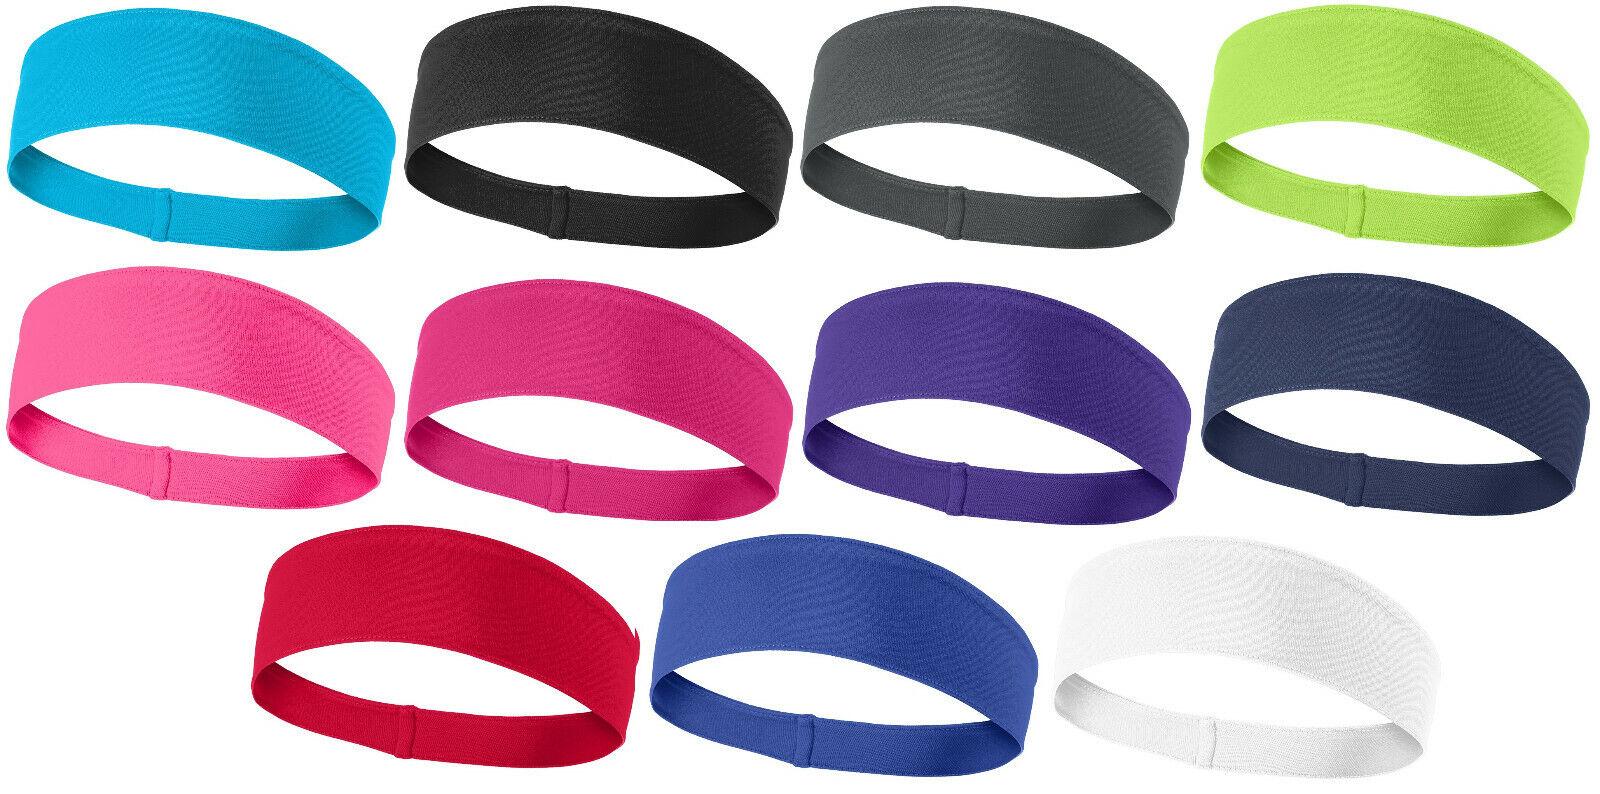 Sport-Tek PosiCharge Competitor Women's Headband Fitness Wor